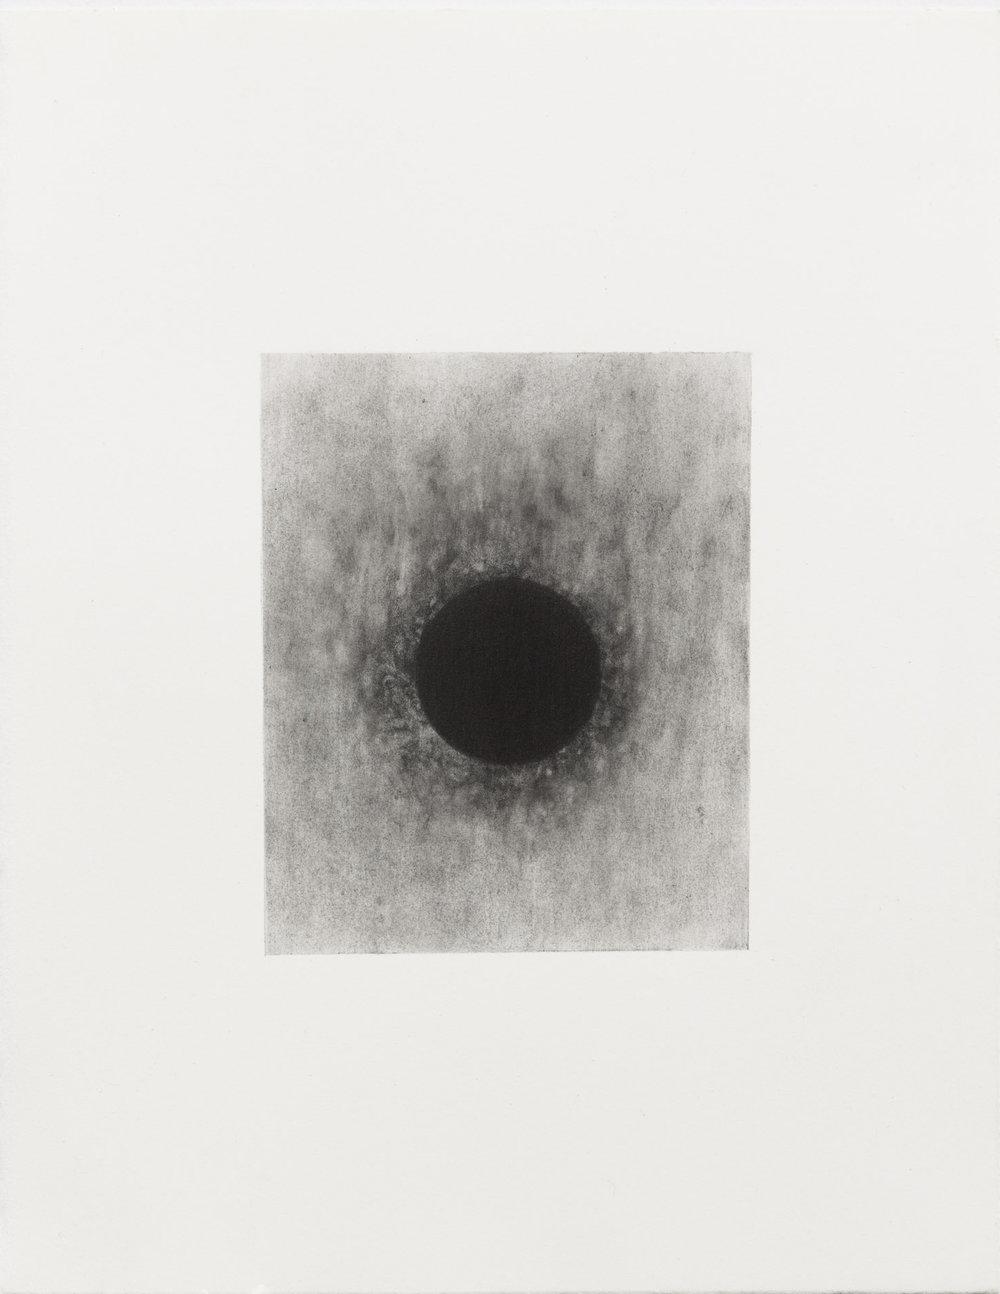 "Carl Trahan,  O   4,  2018, graphite on paper, 5"" x 4"" (12 x 10 cm)"